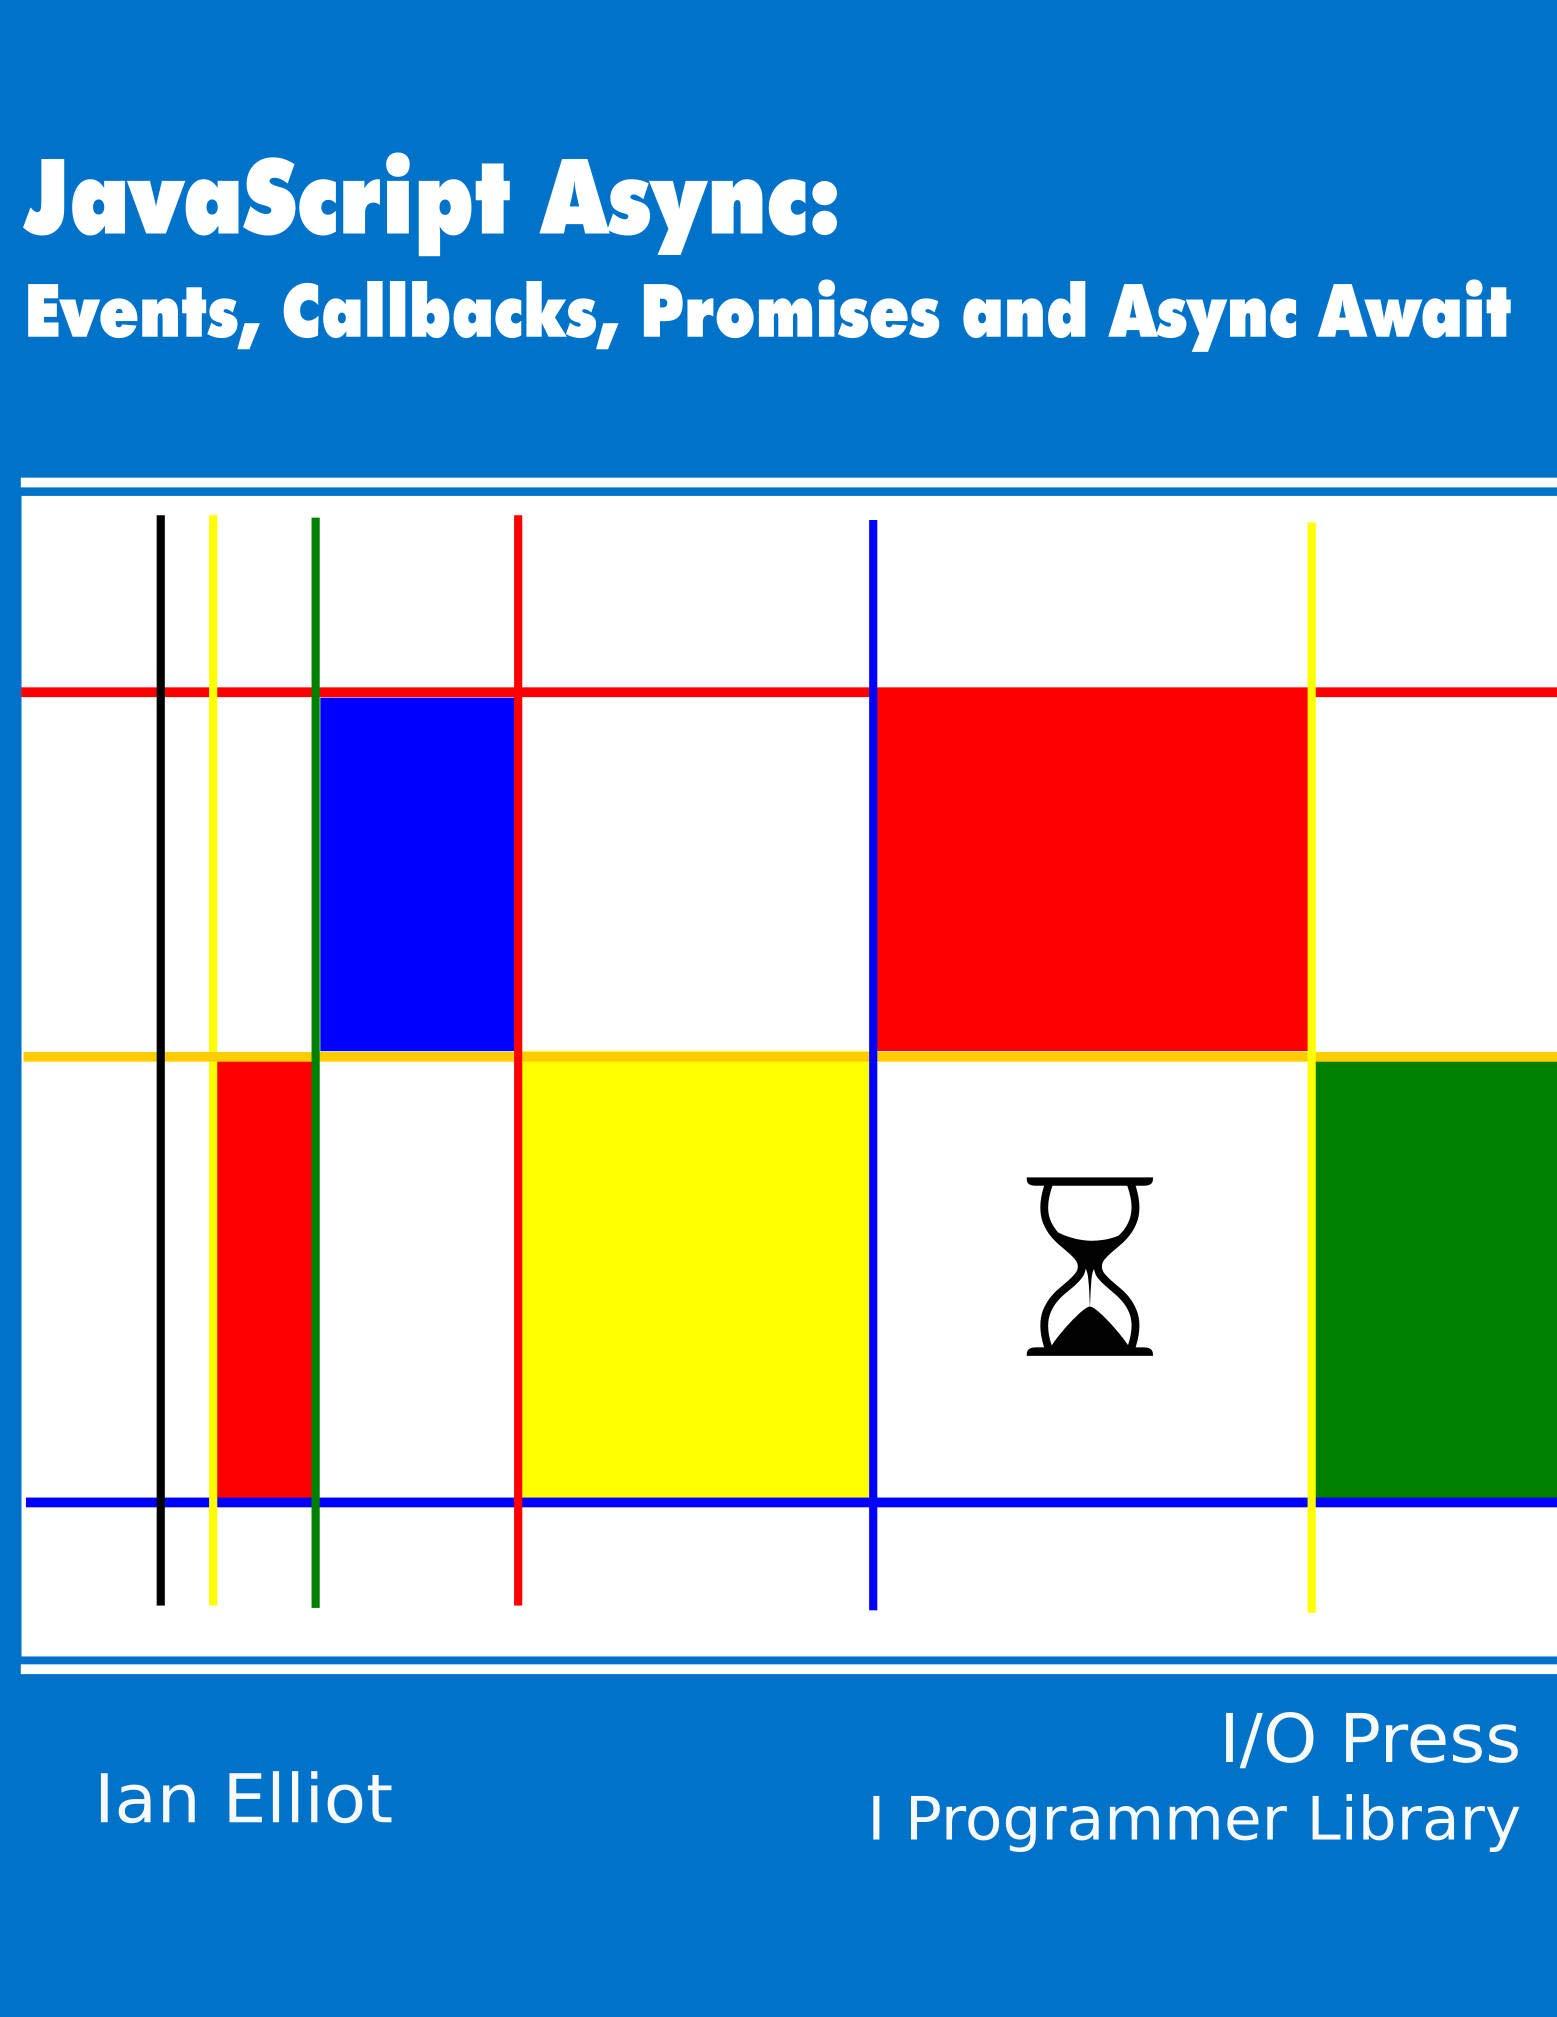 JavaScript Async: Events, Callbacks, Promises and Async Await